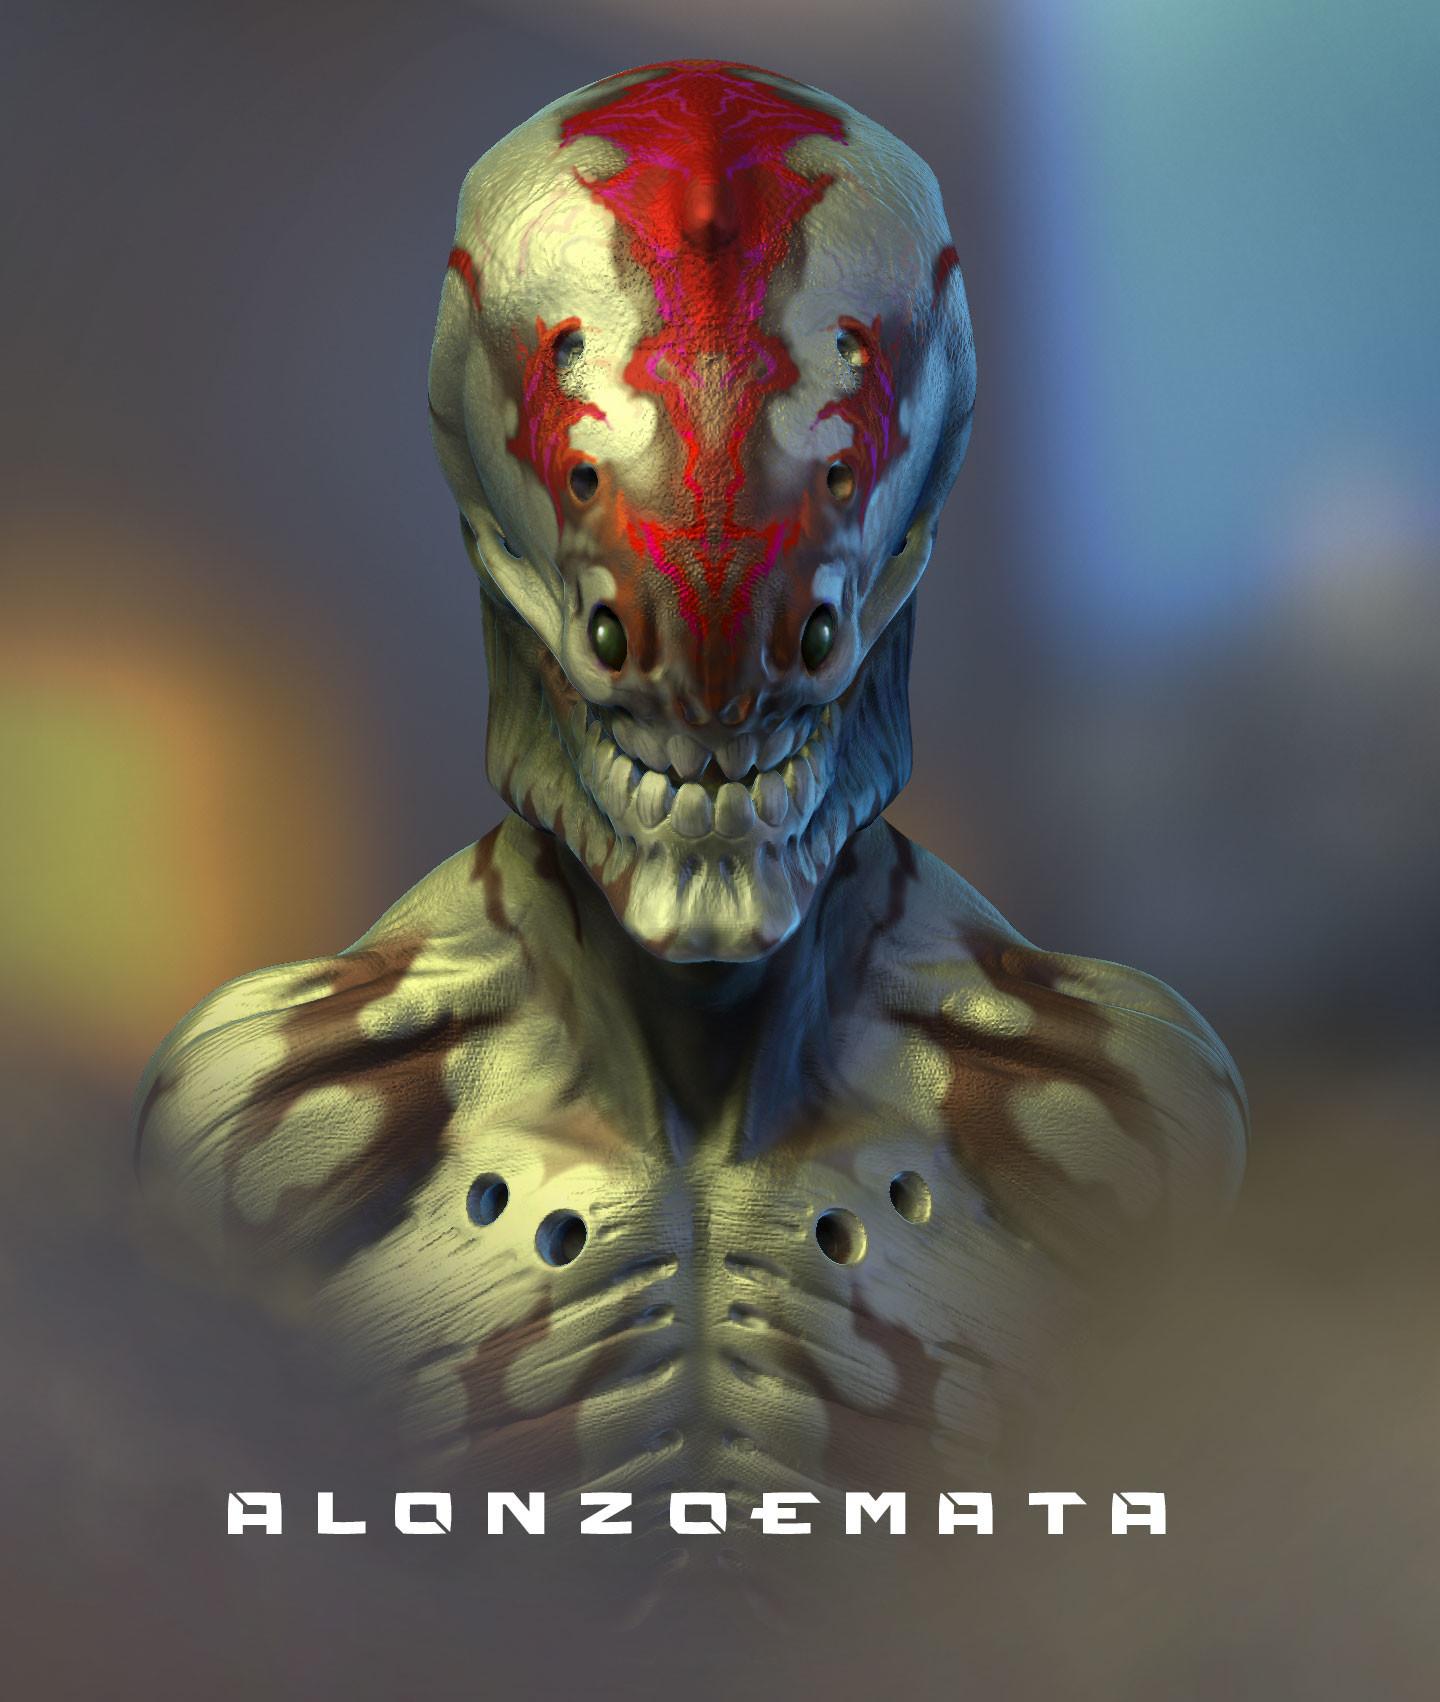 Alonzo emata alien skull